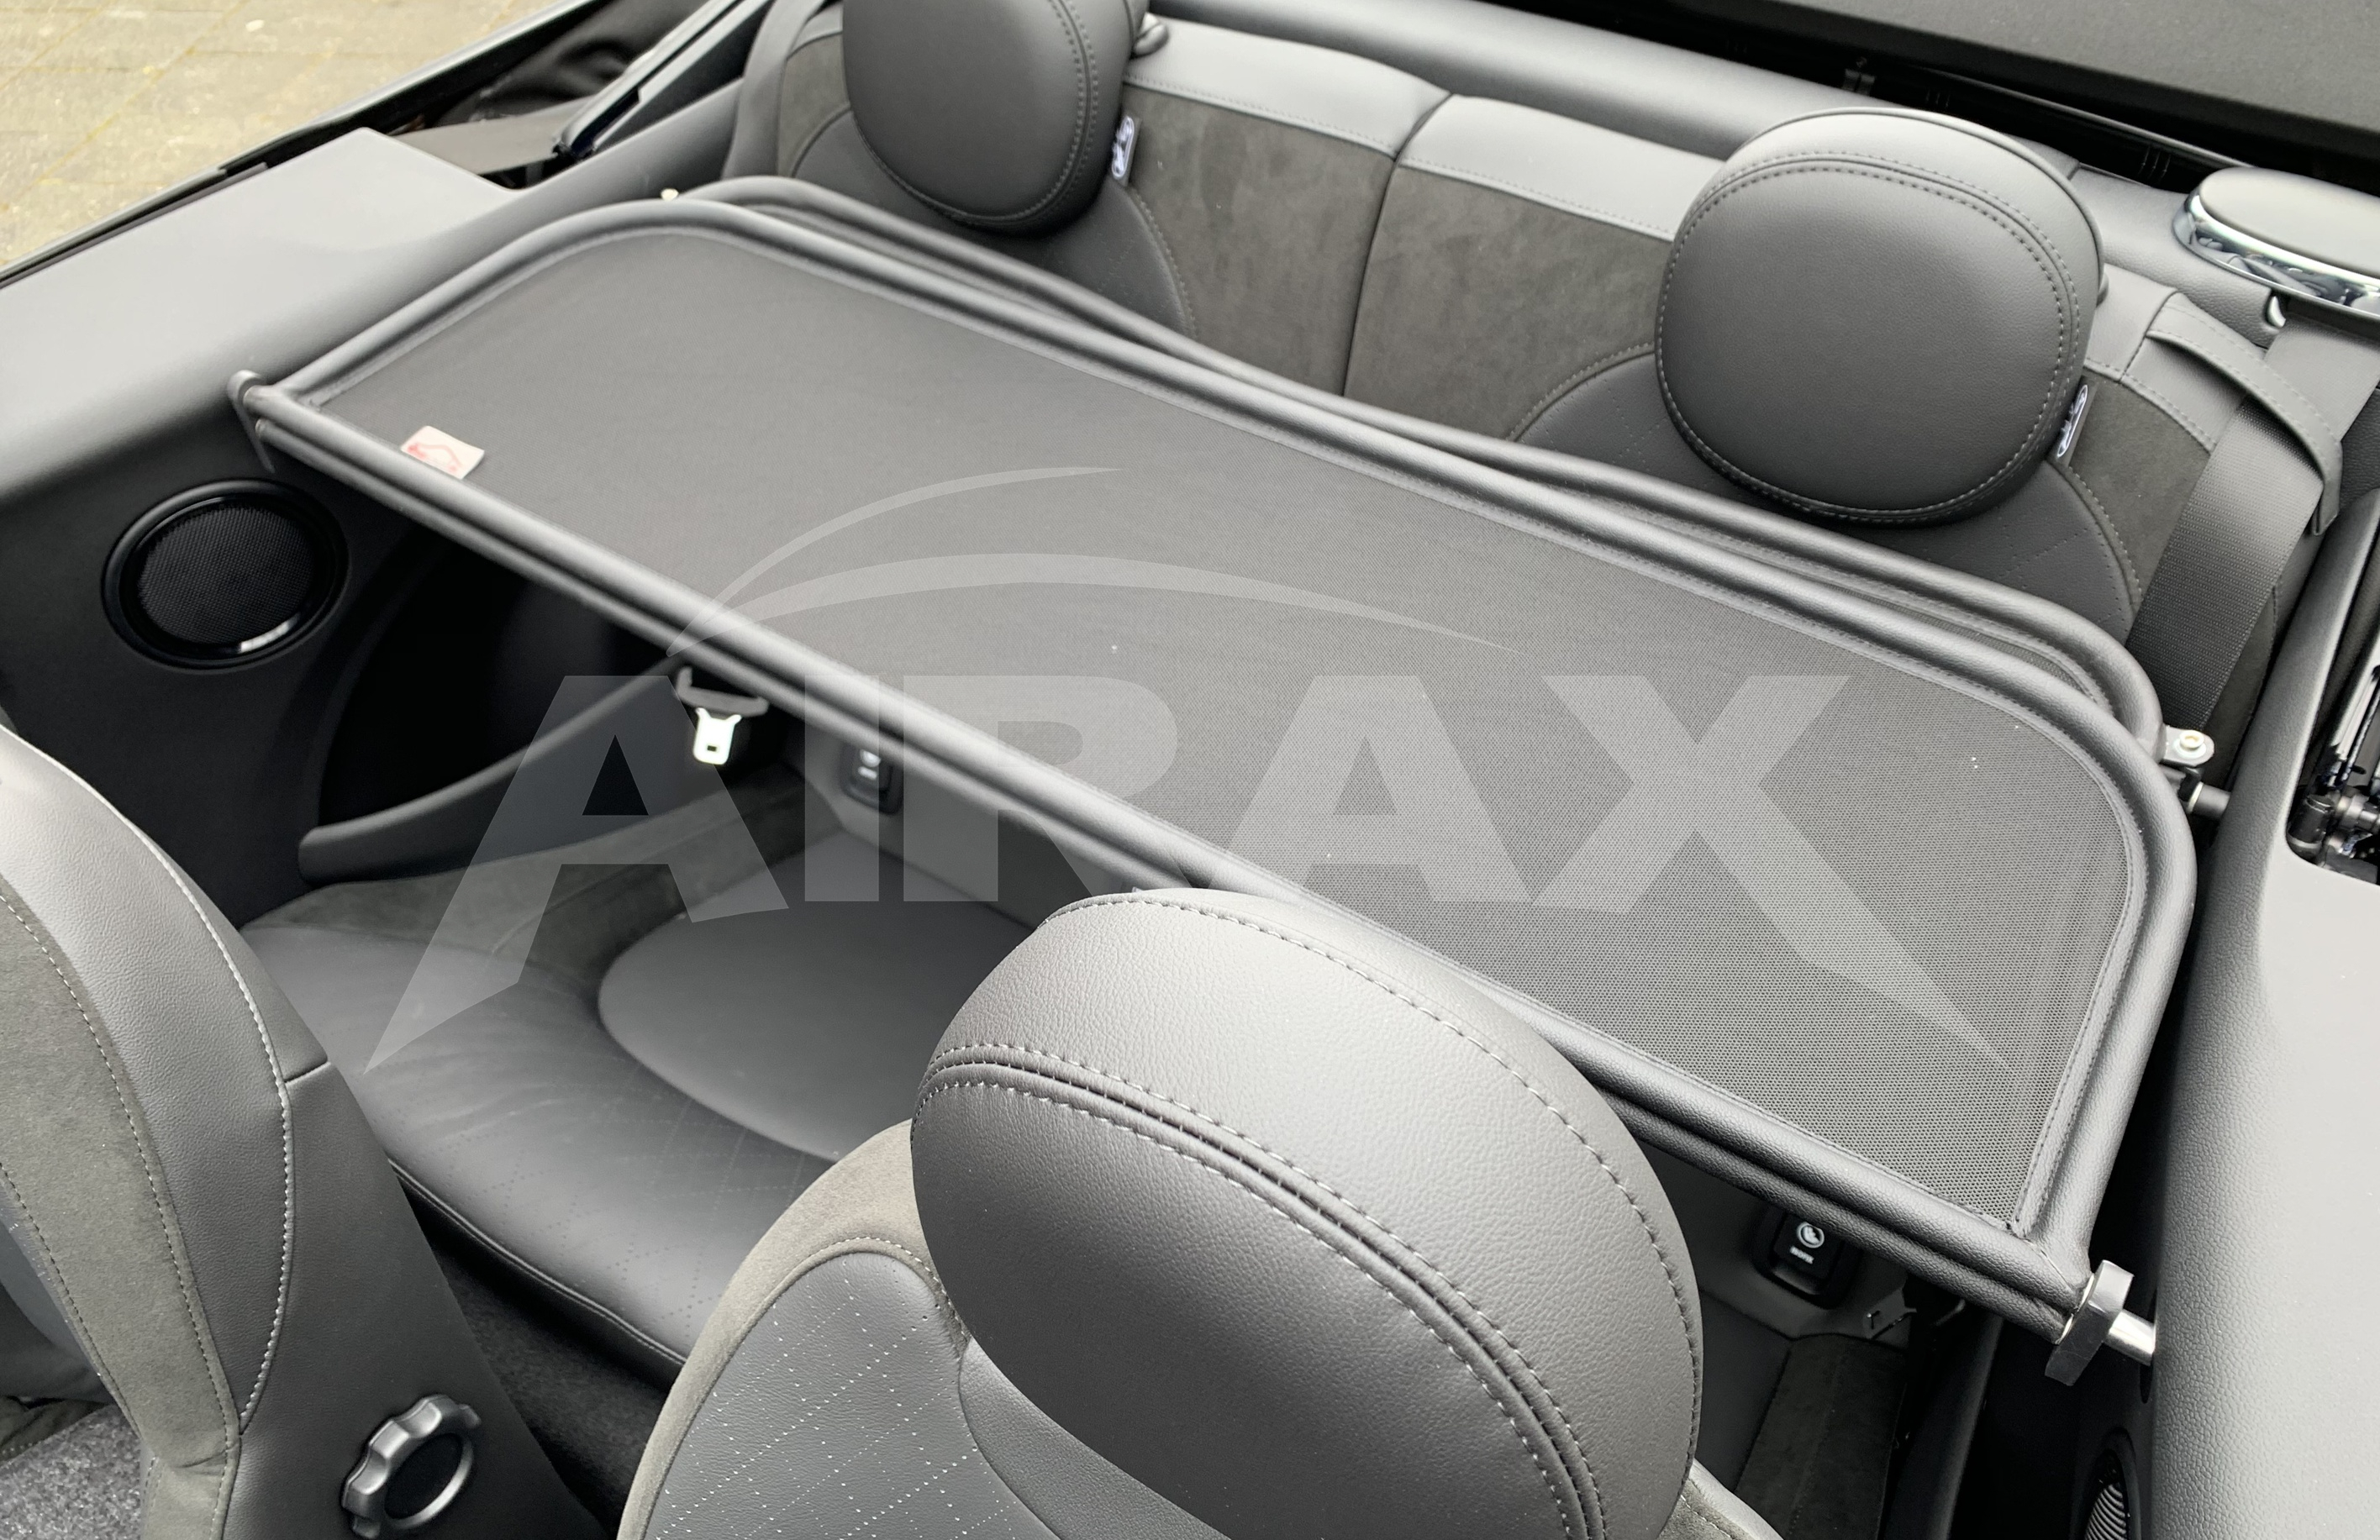 AIRAX Windschott Wind deflector Windschermen BMW Mini Convertible F57 14-2019